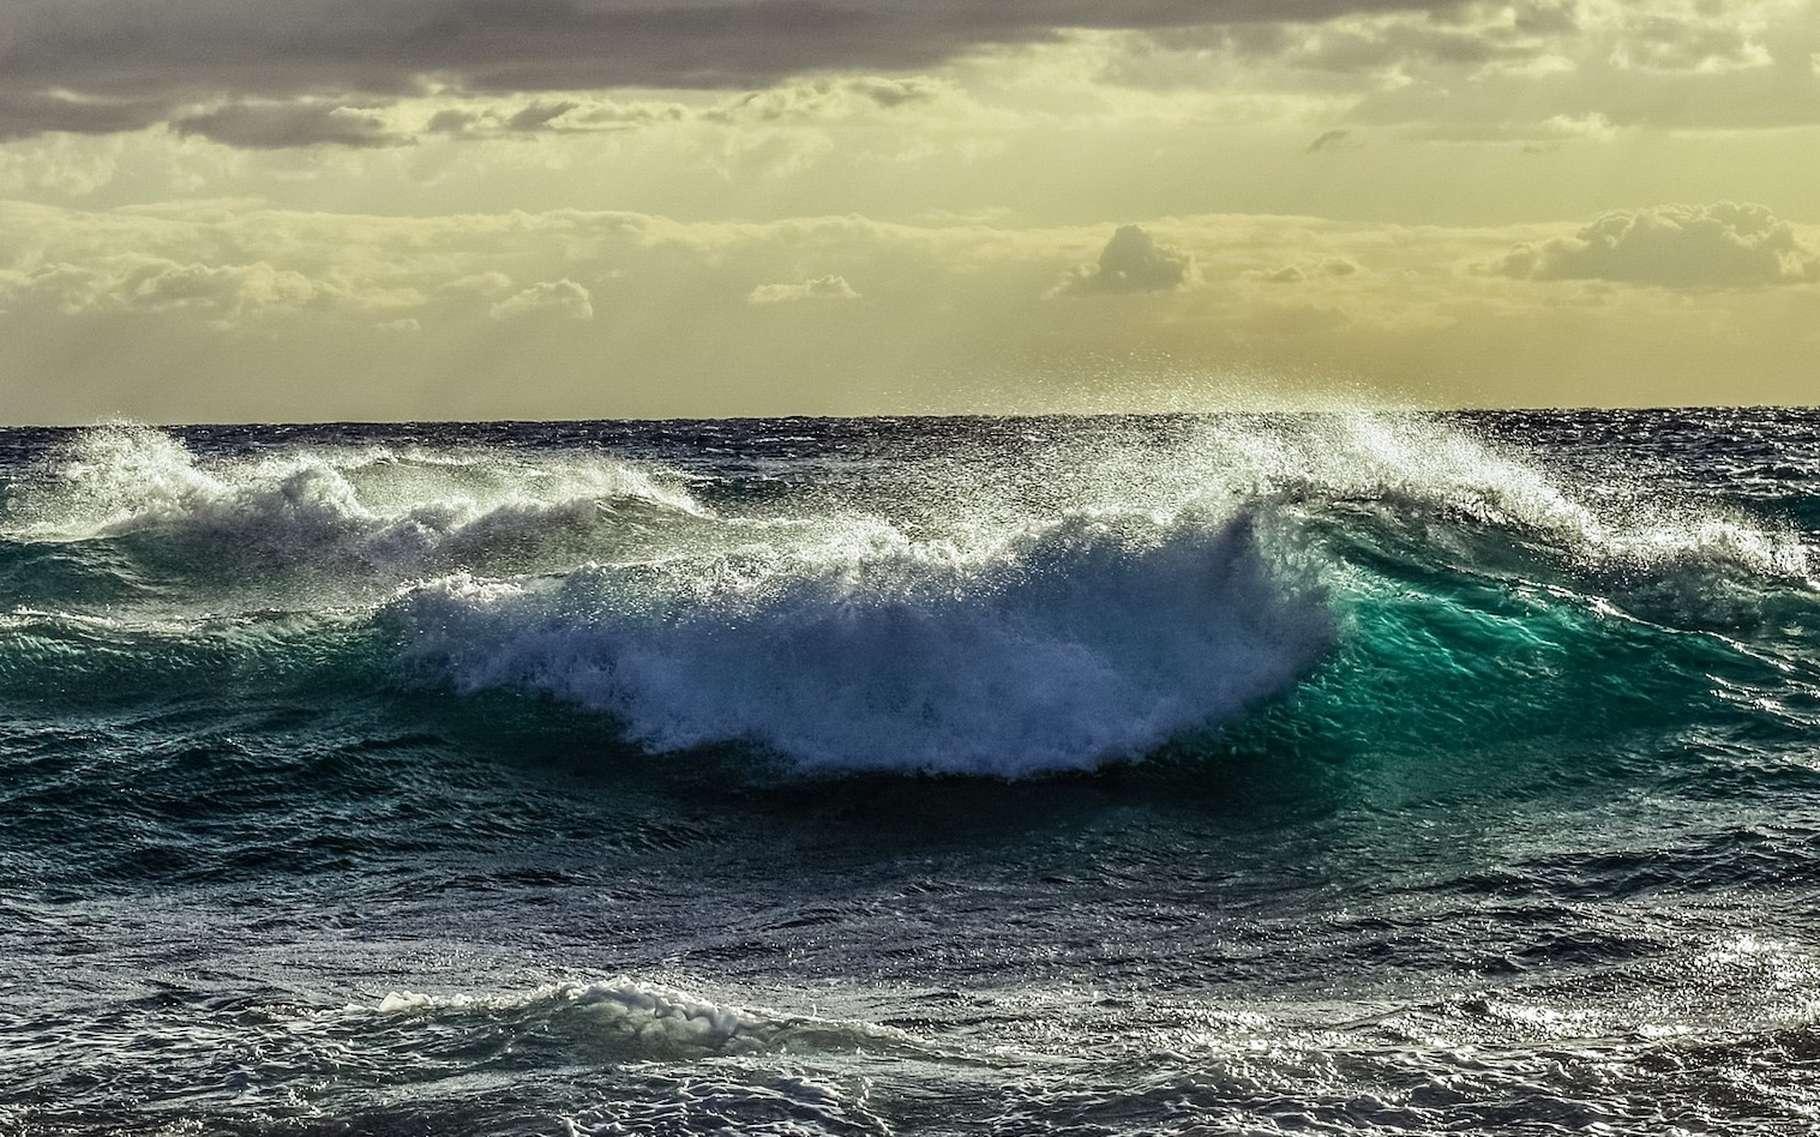 Le potentiel énergétique naturel des énergies marines apparaît gigantesque. © dimitrisvetsikas, Pixabay, Pixabay License